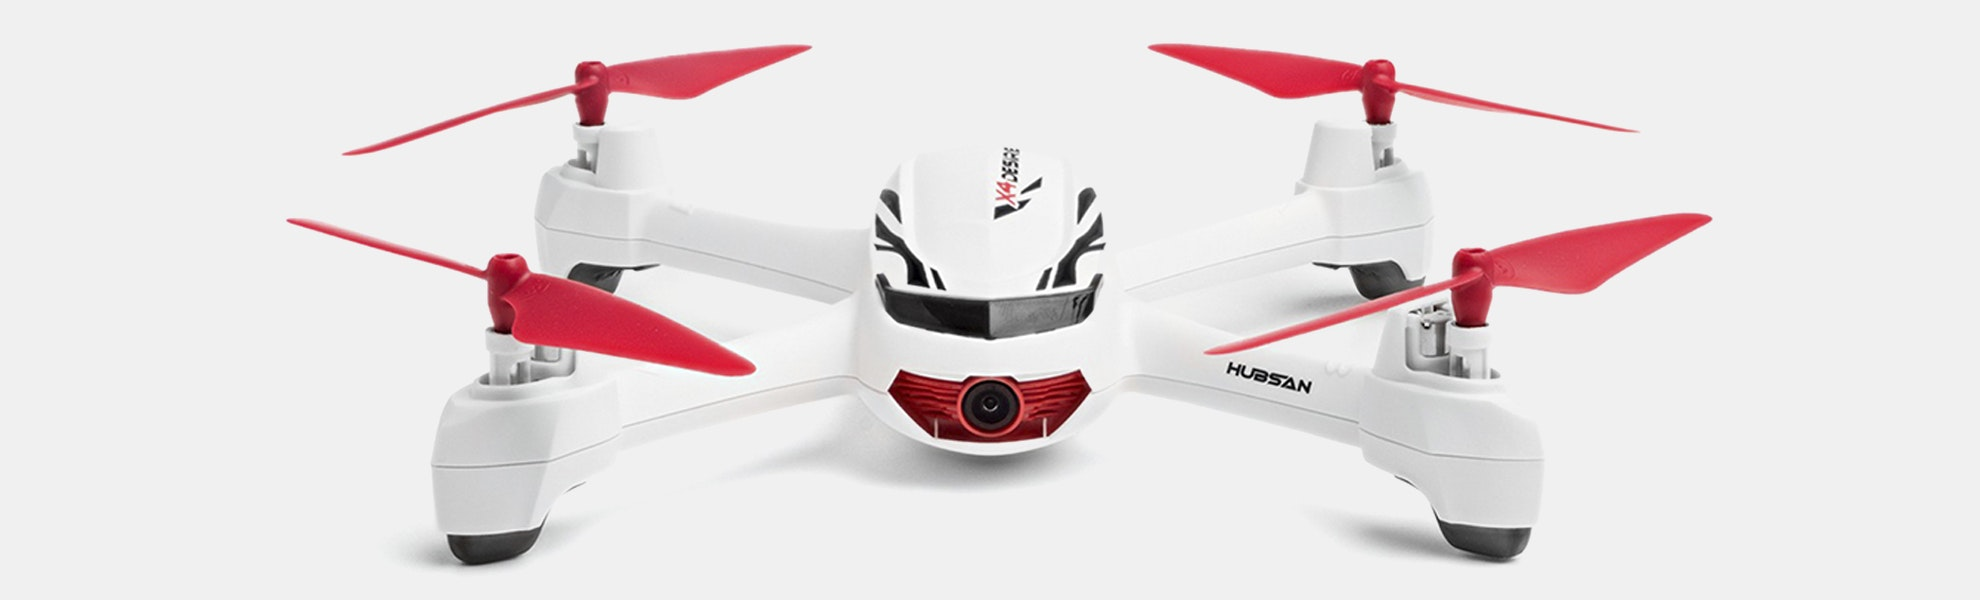 Hubsan X4 H502E Desire Drone